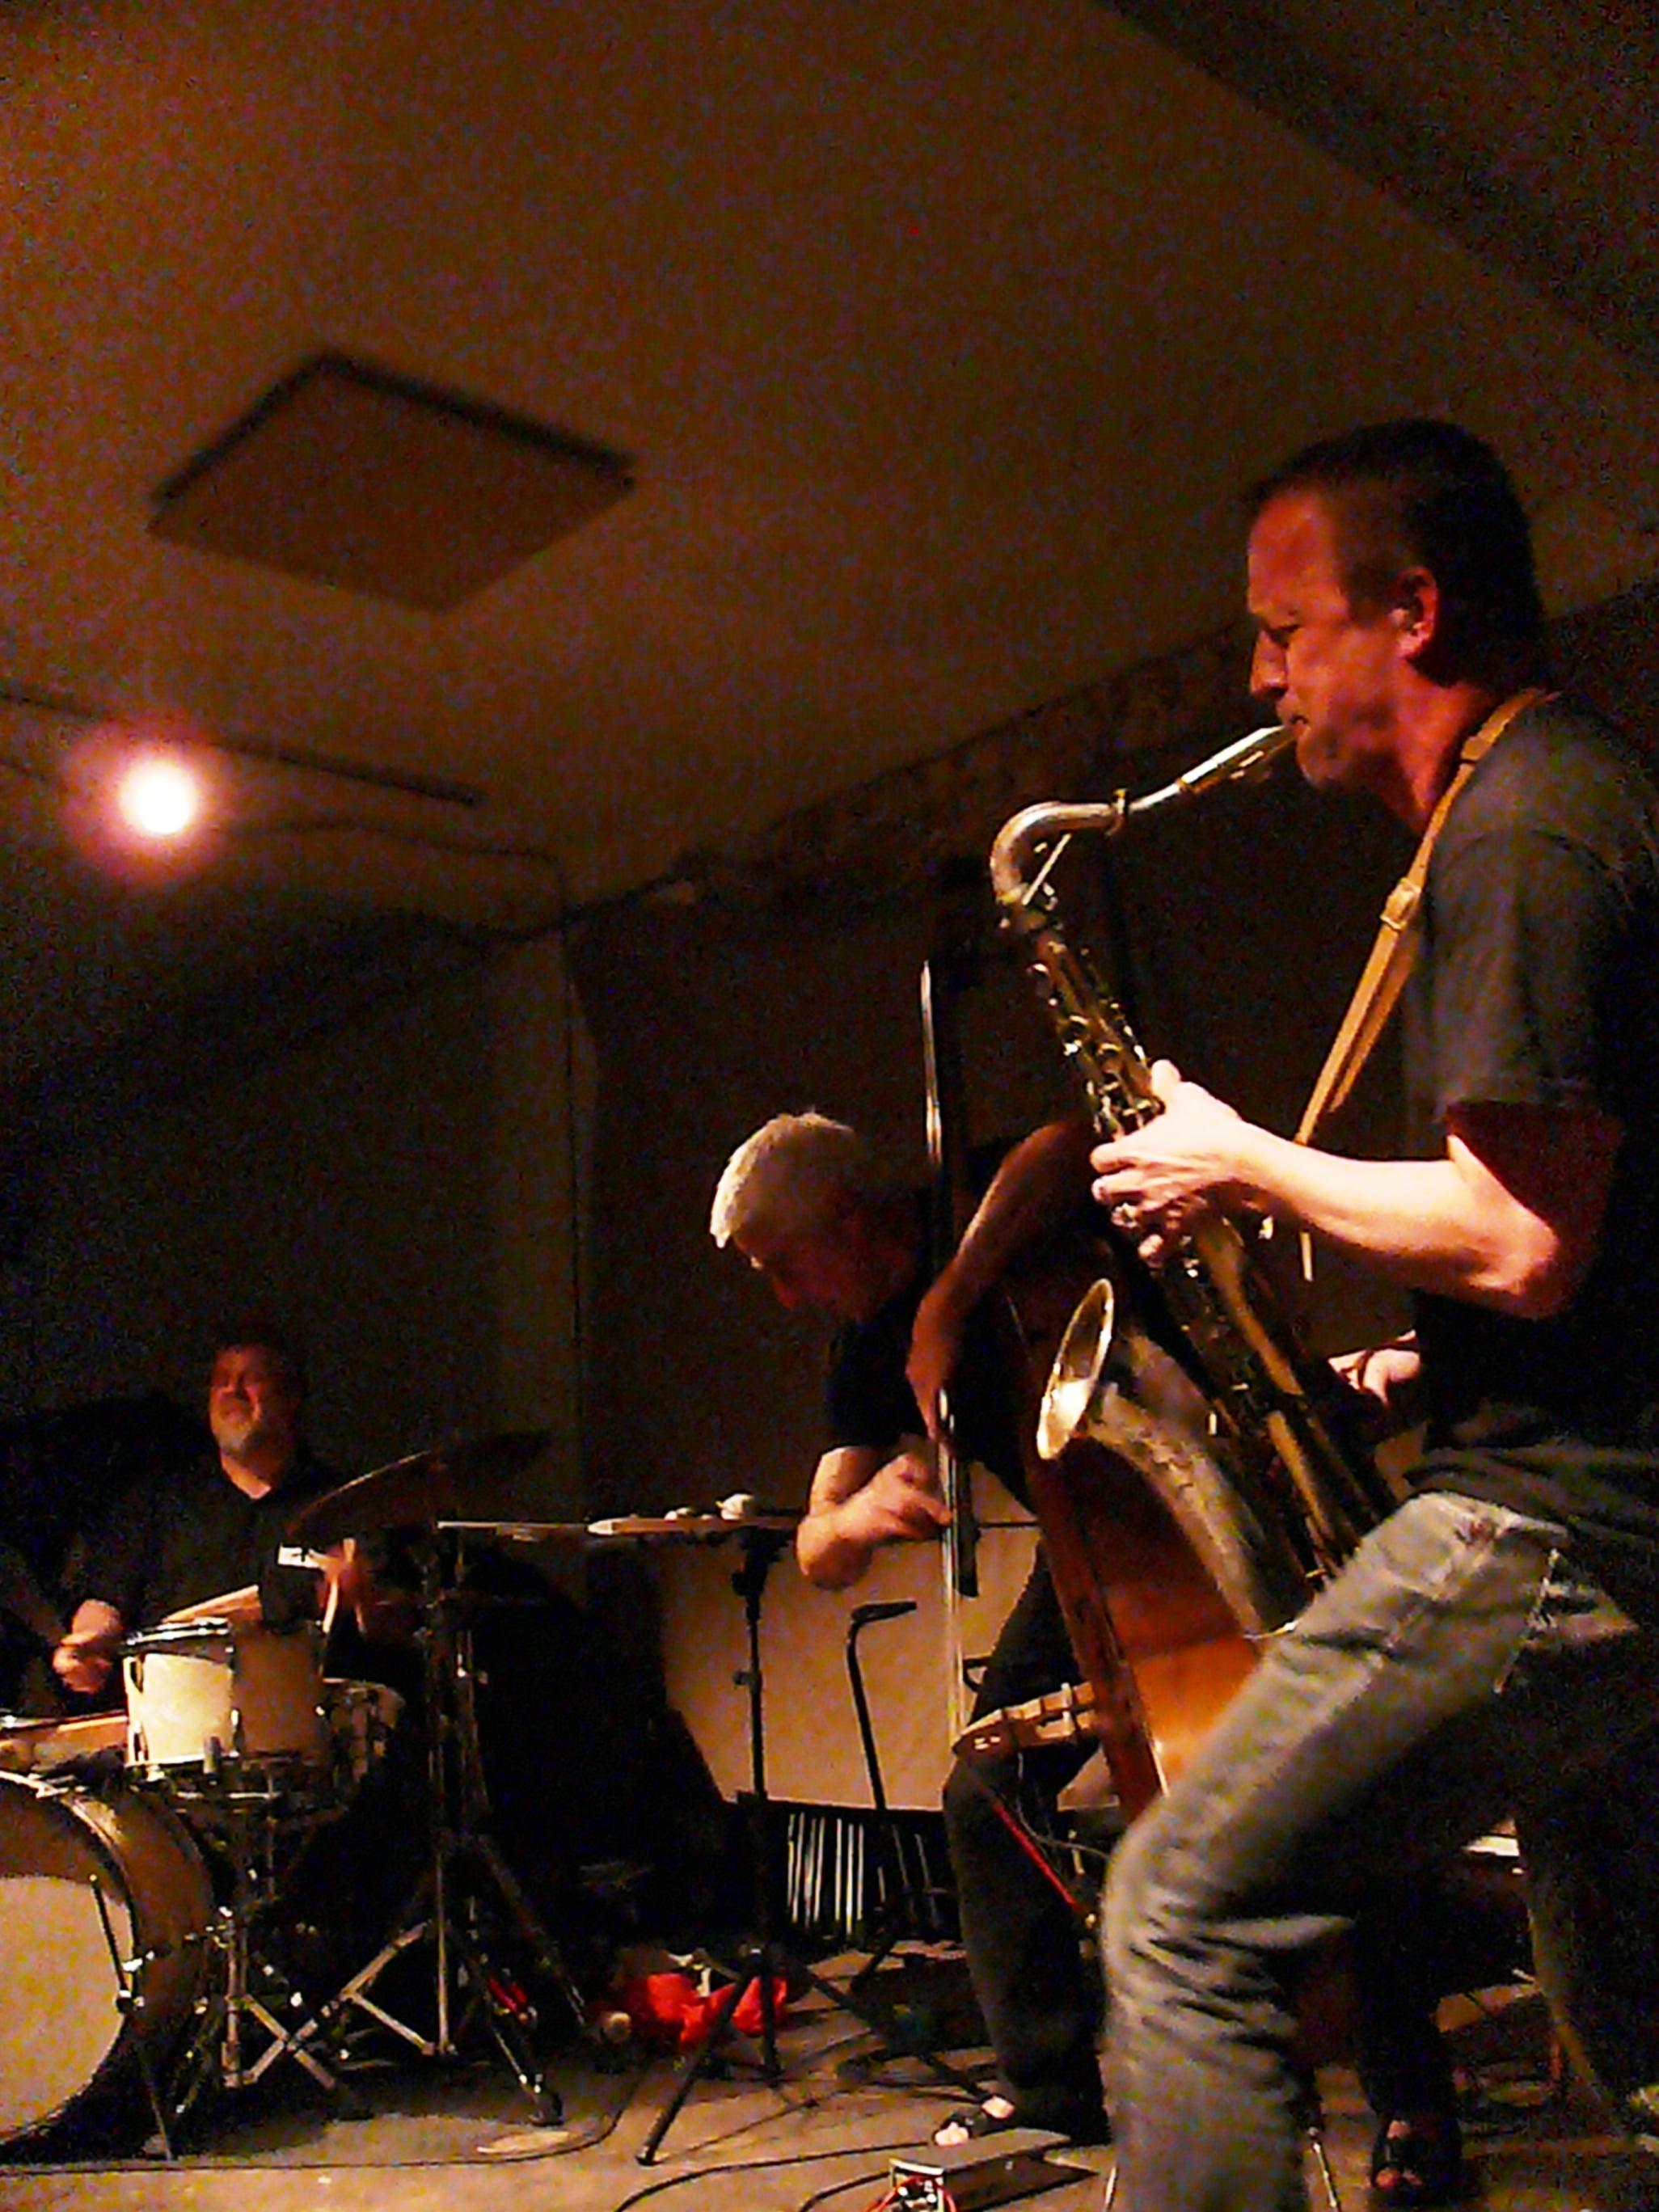 Tarfala Trio at Cafe Oto, London in May 2011